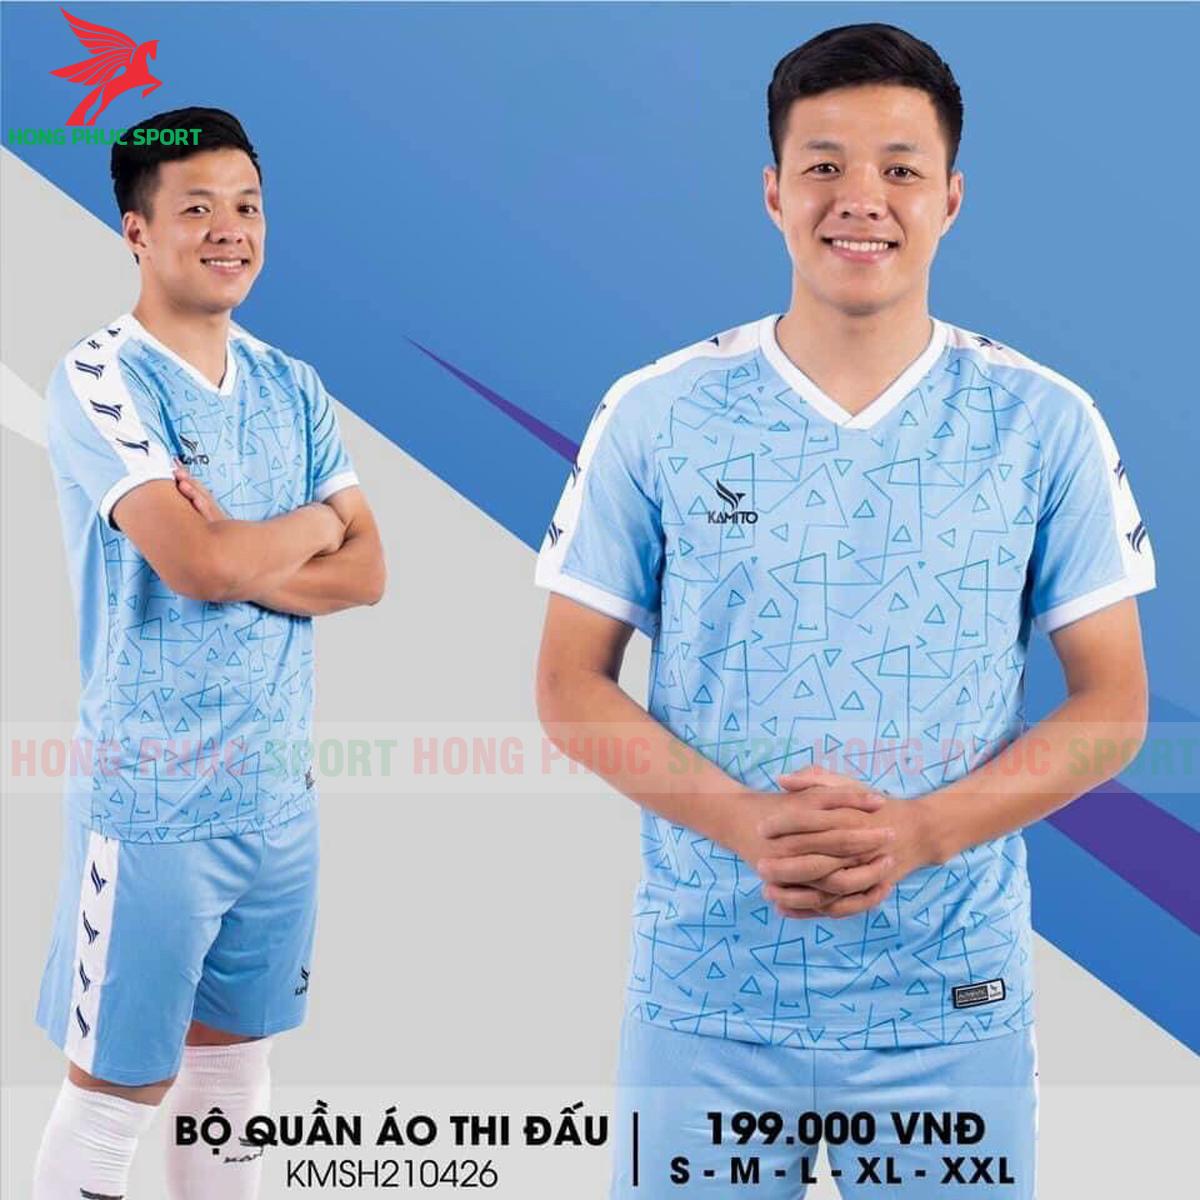 https://cdn.hongphucsport.com/unsafe/s4.shopbay.vn/files/285/ao-khong-logo-kamito-kmsh210426-6076a45167204.png